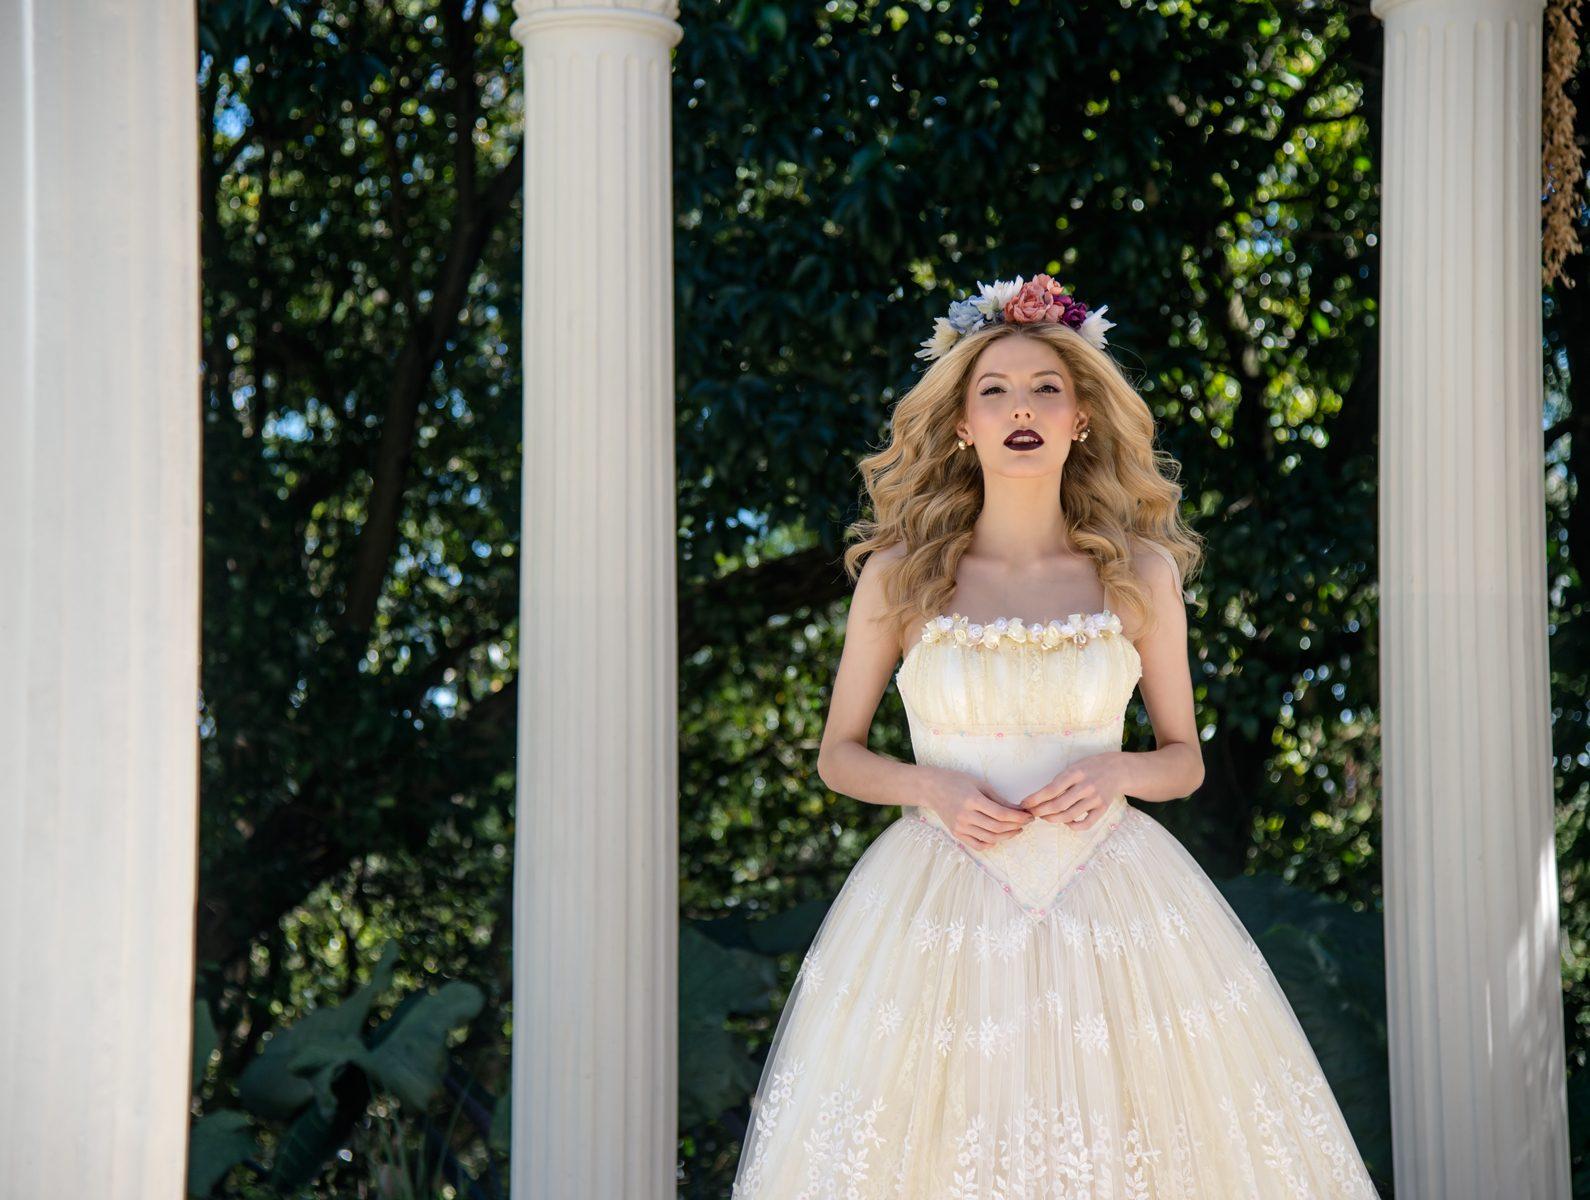 Vestido Giselle